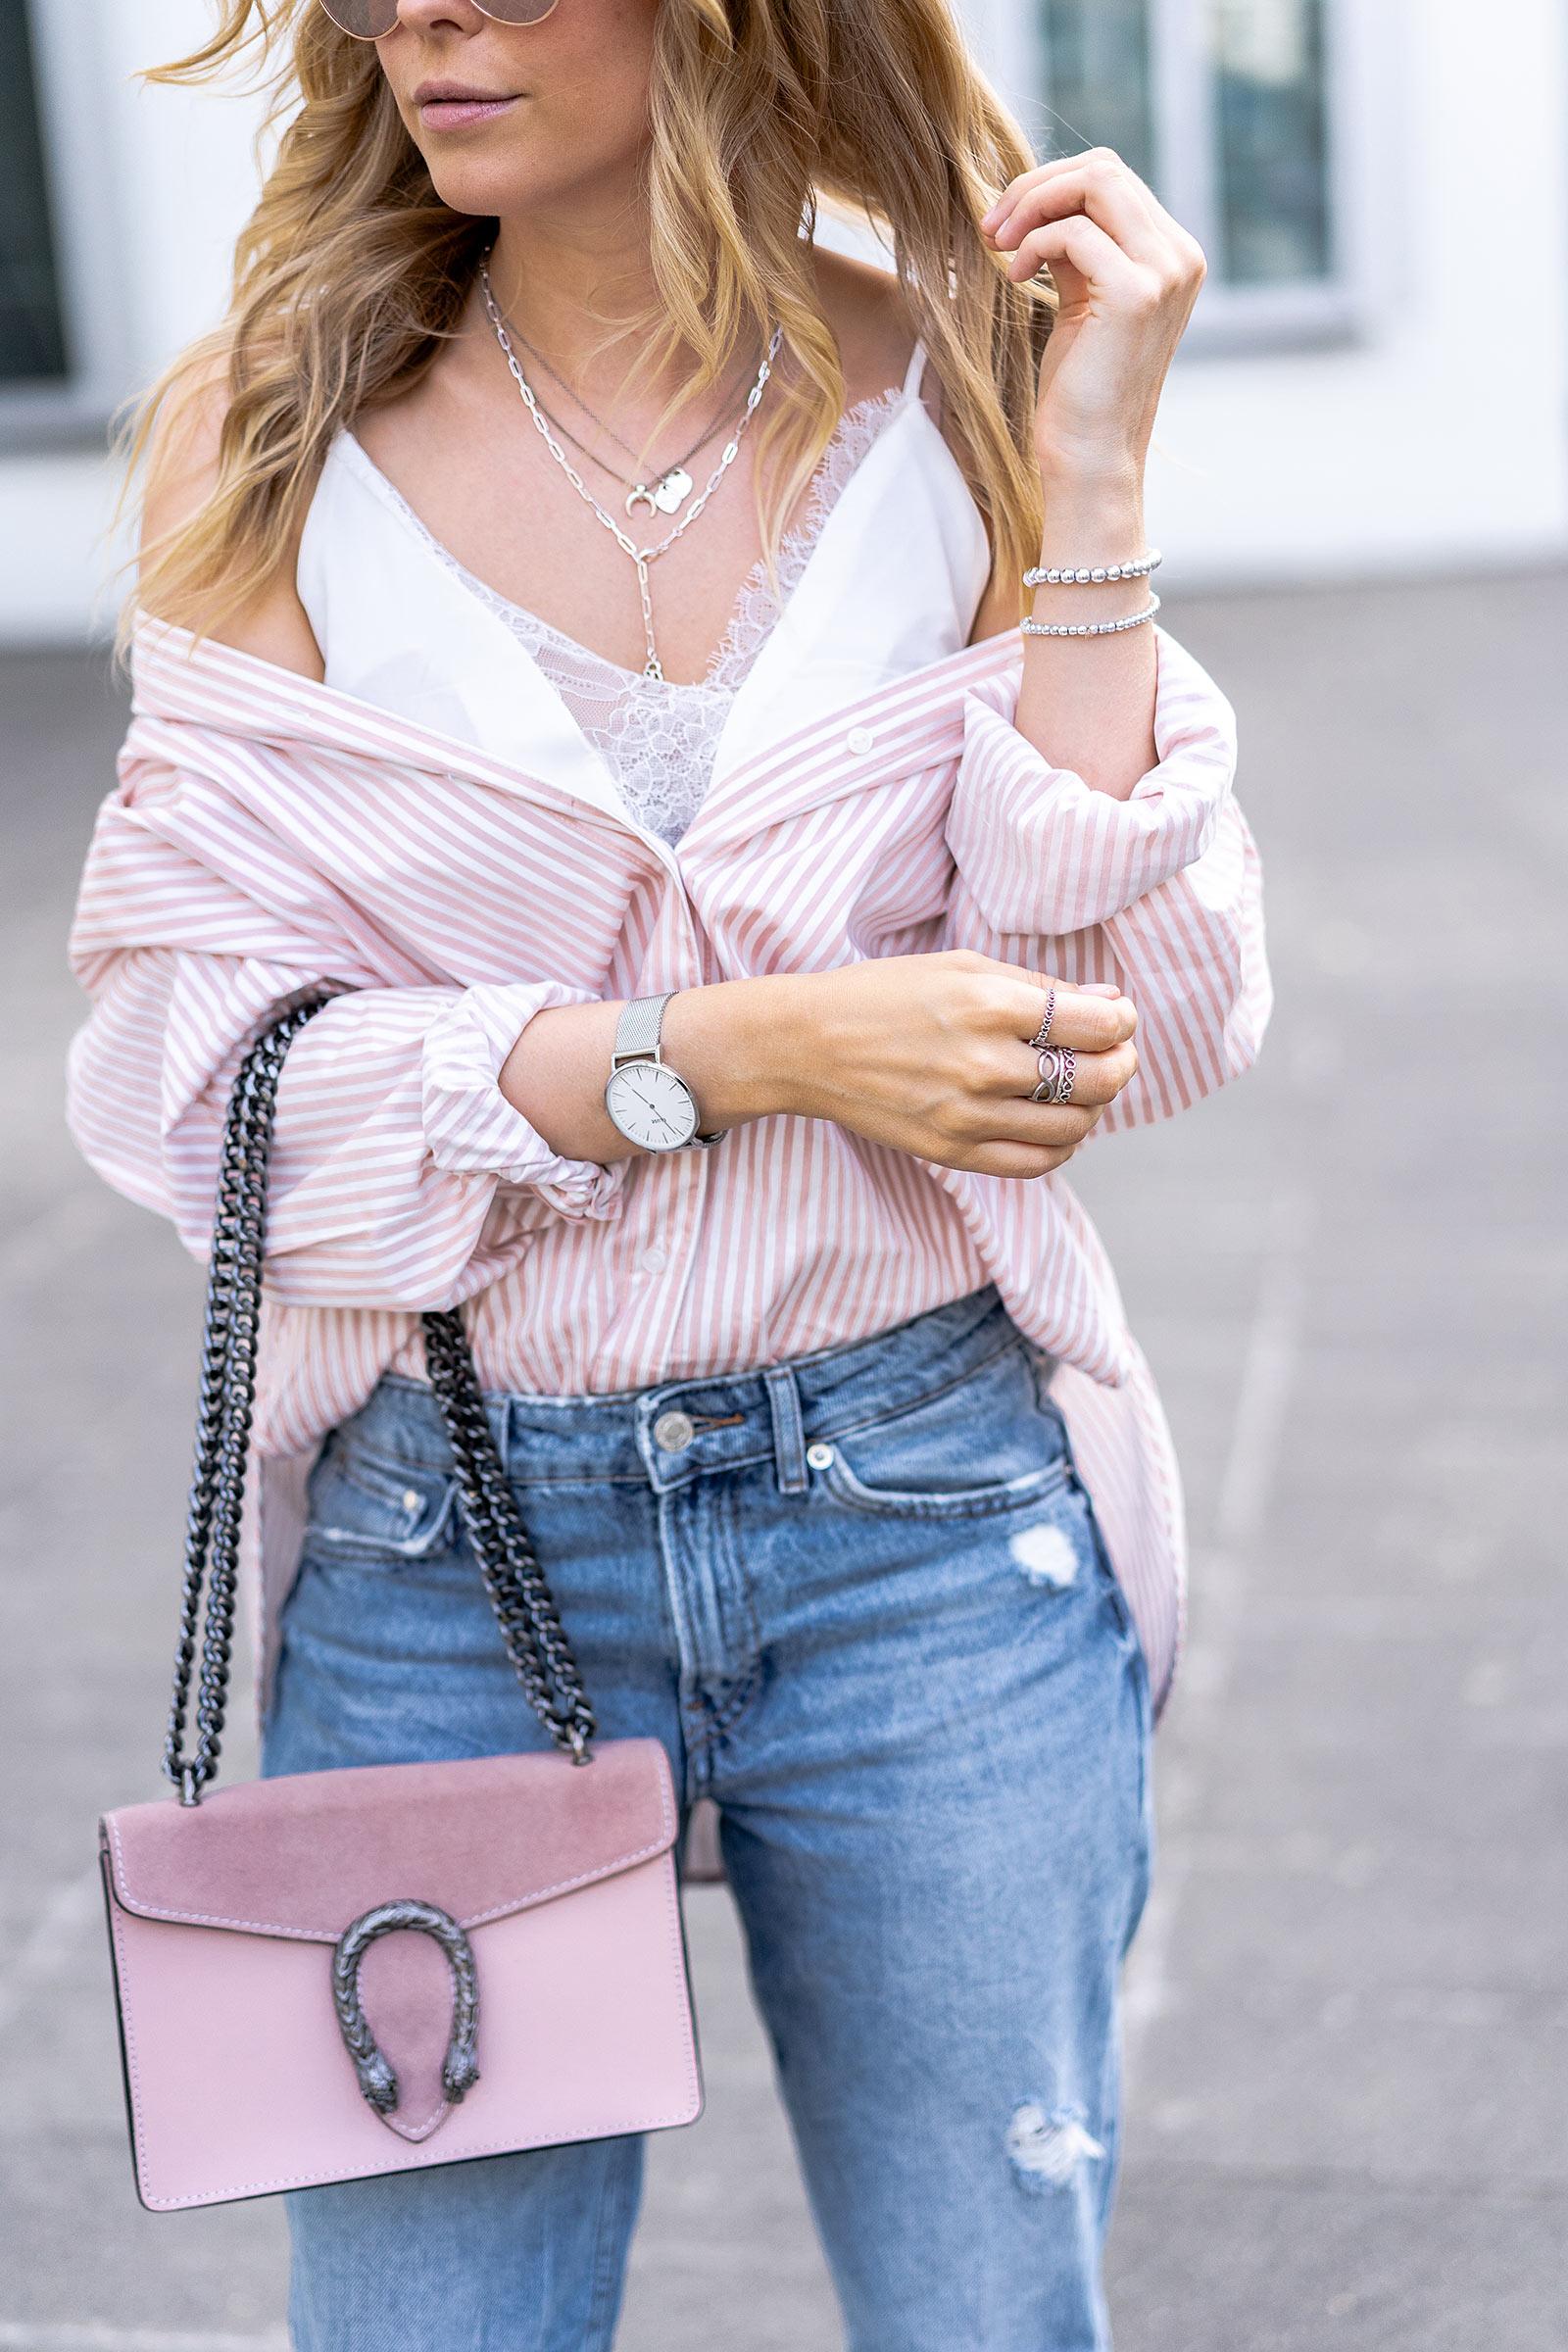 obersize hemdbluse h&m outfit modeblogsunnyinga